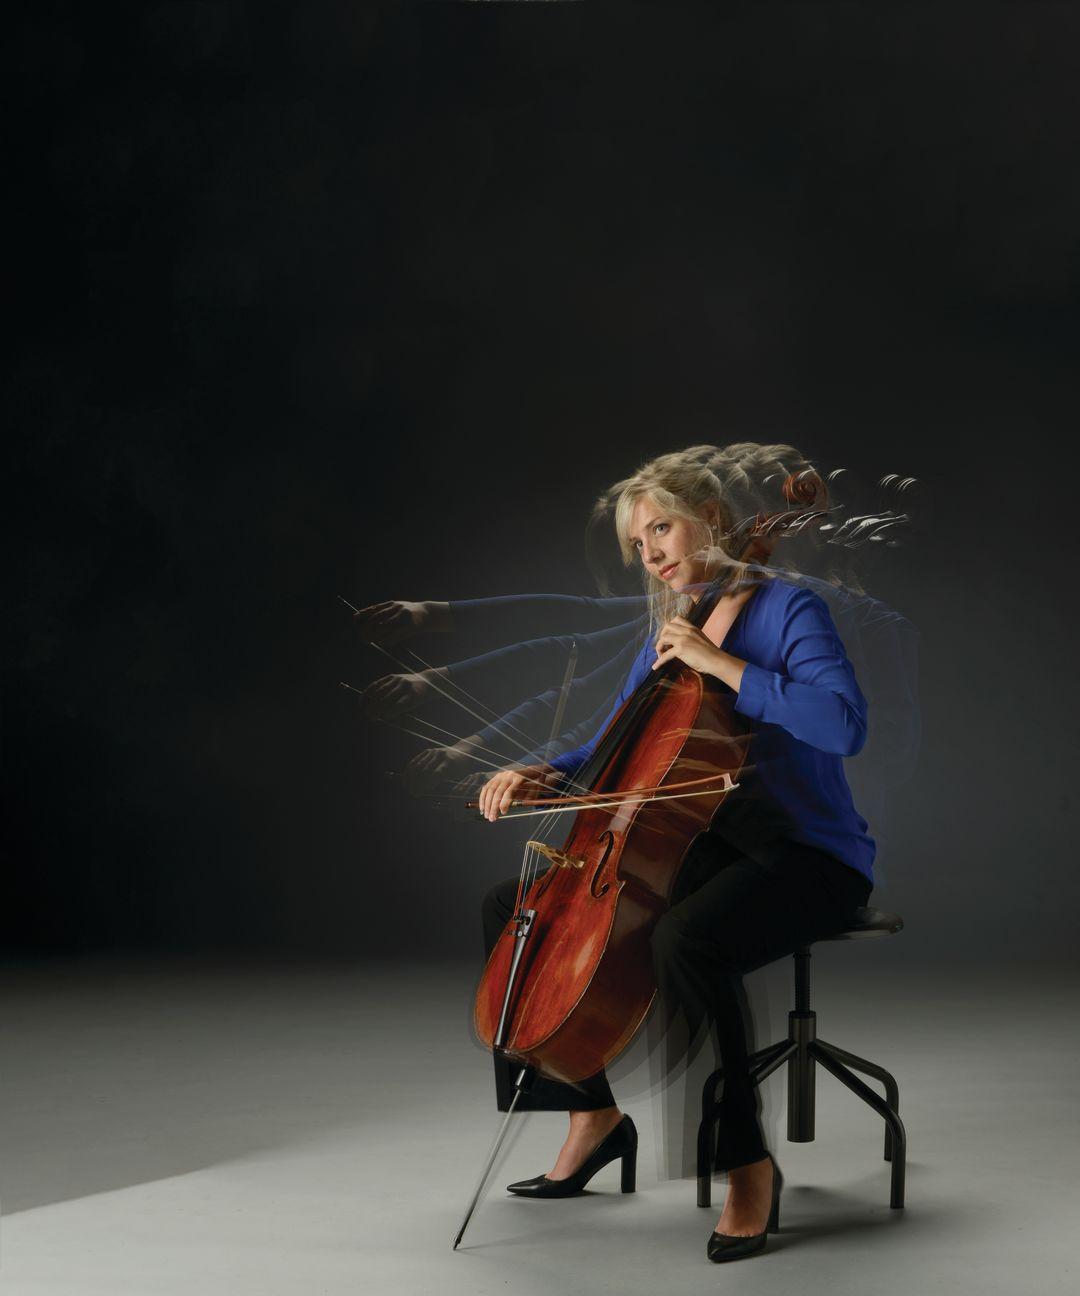 Sarasota orchestra natalie helm prdxka